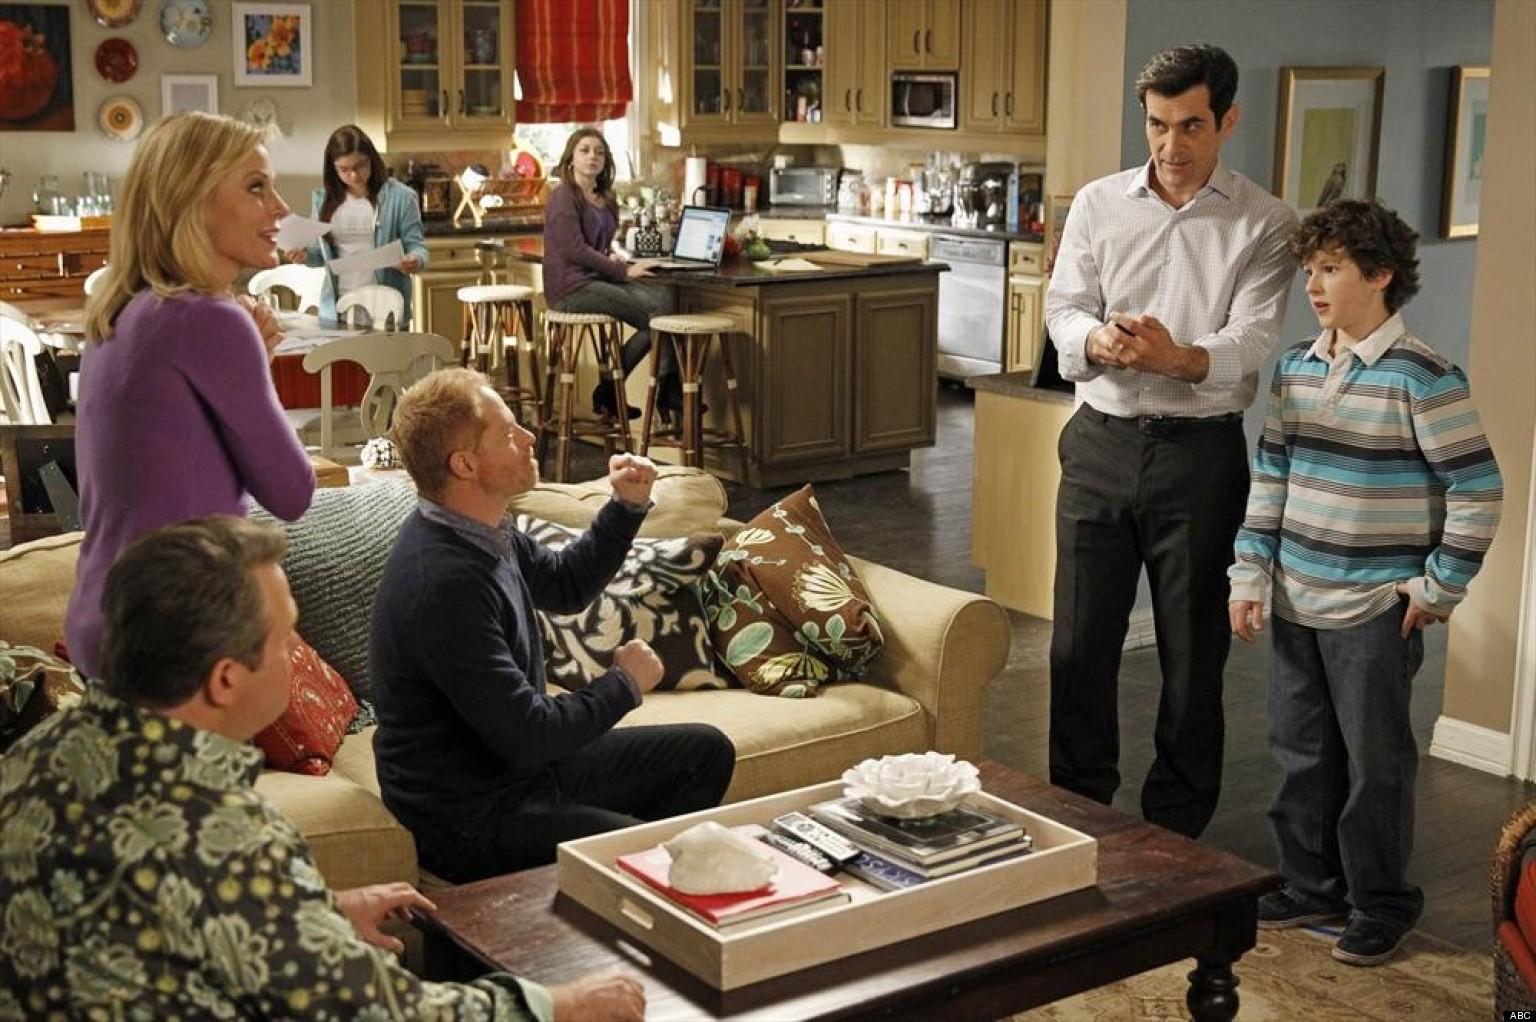 39 modern family 39 renewed abc orders season 5 huffpost for Modern family dunphy house decor